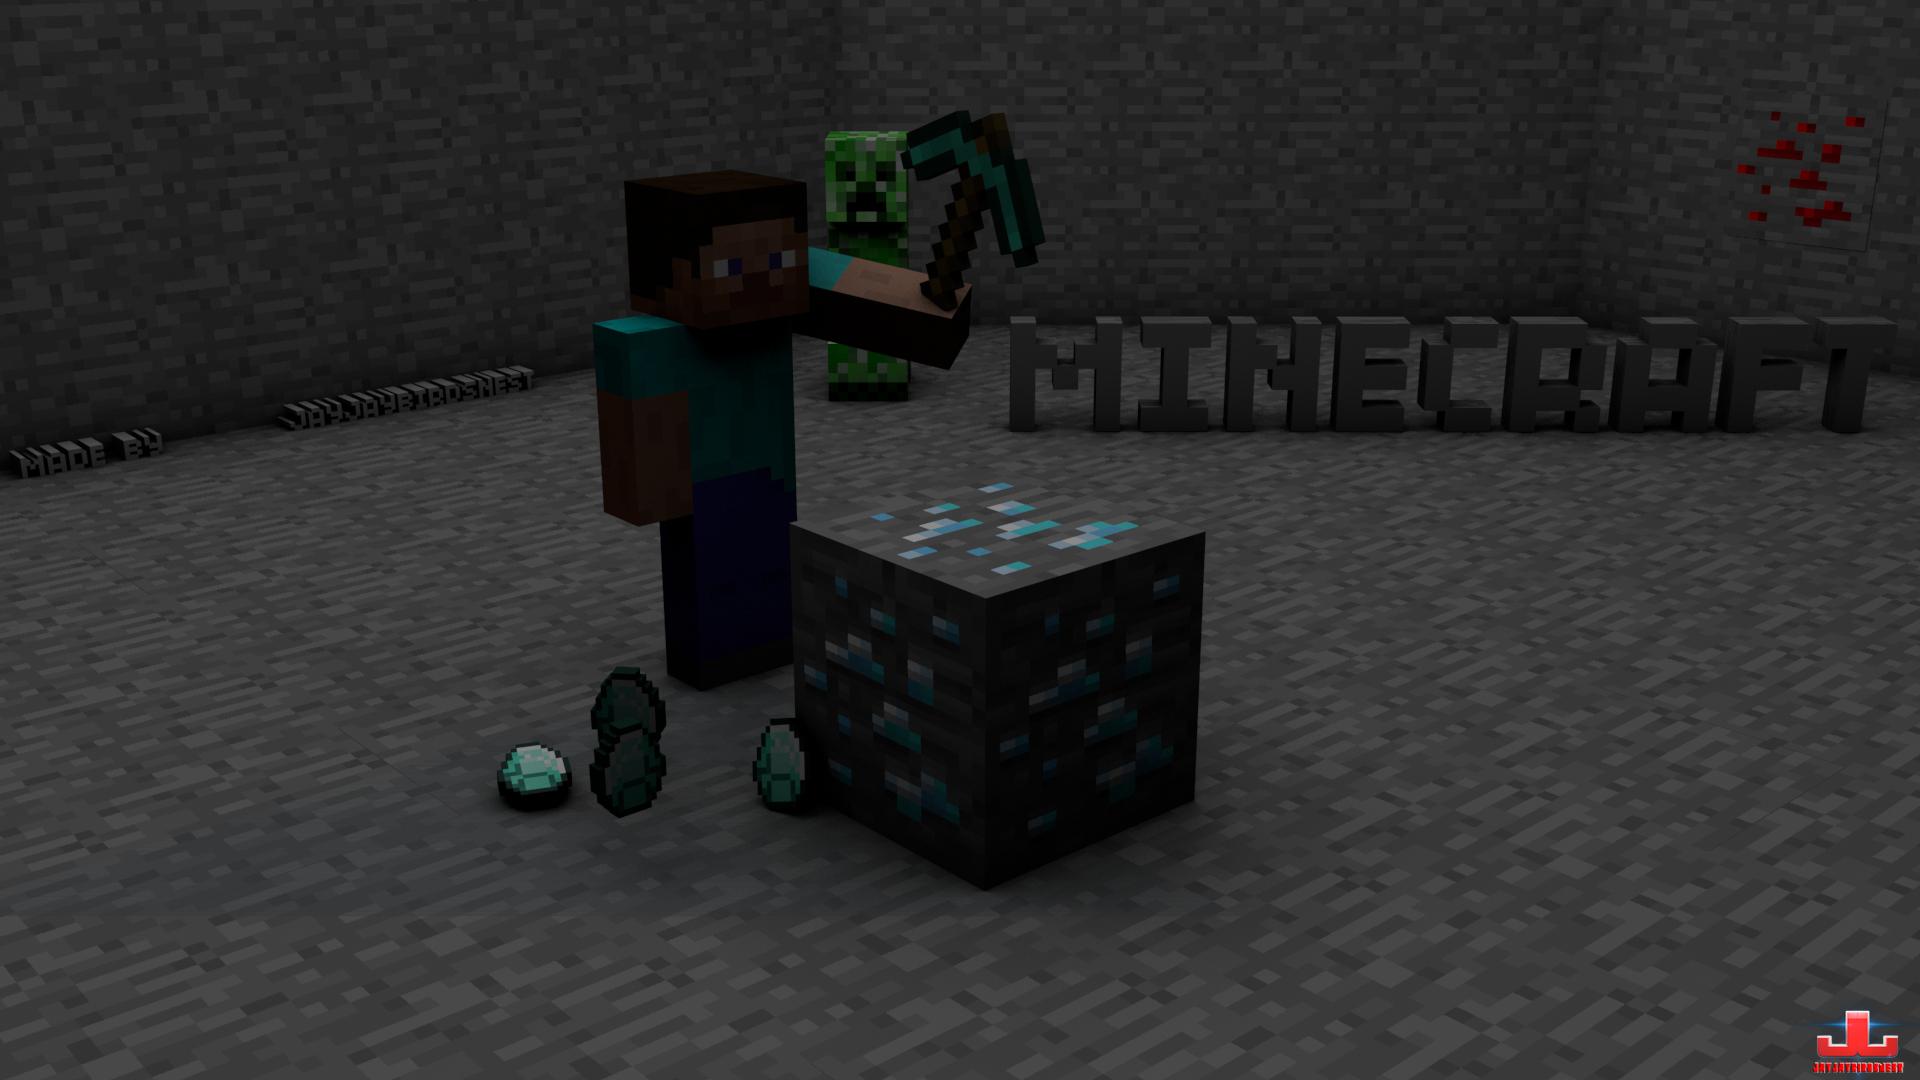 Minecraft wallpaper hd diamond